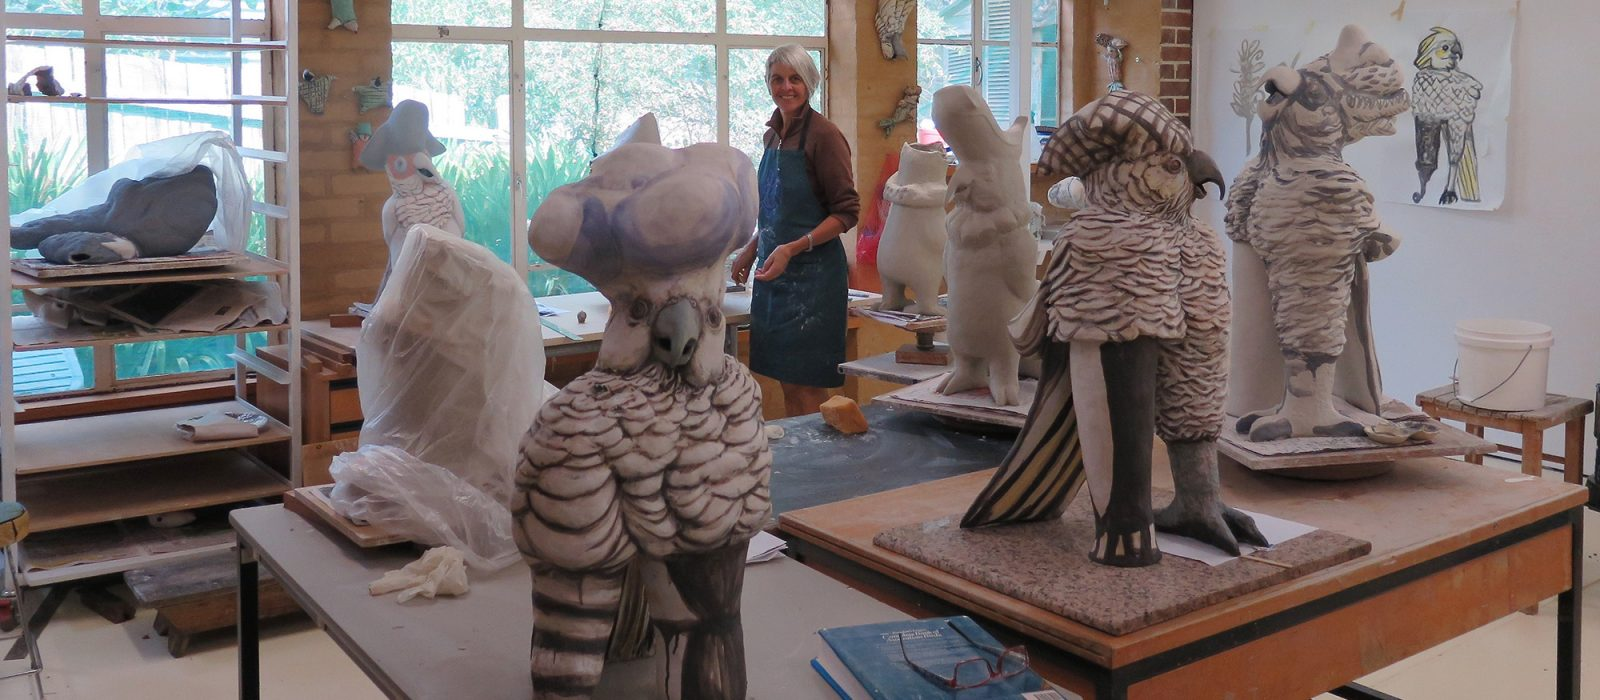 Bev Hogg in her studio. Photo: Courtesy of the artist.